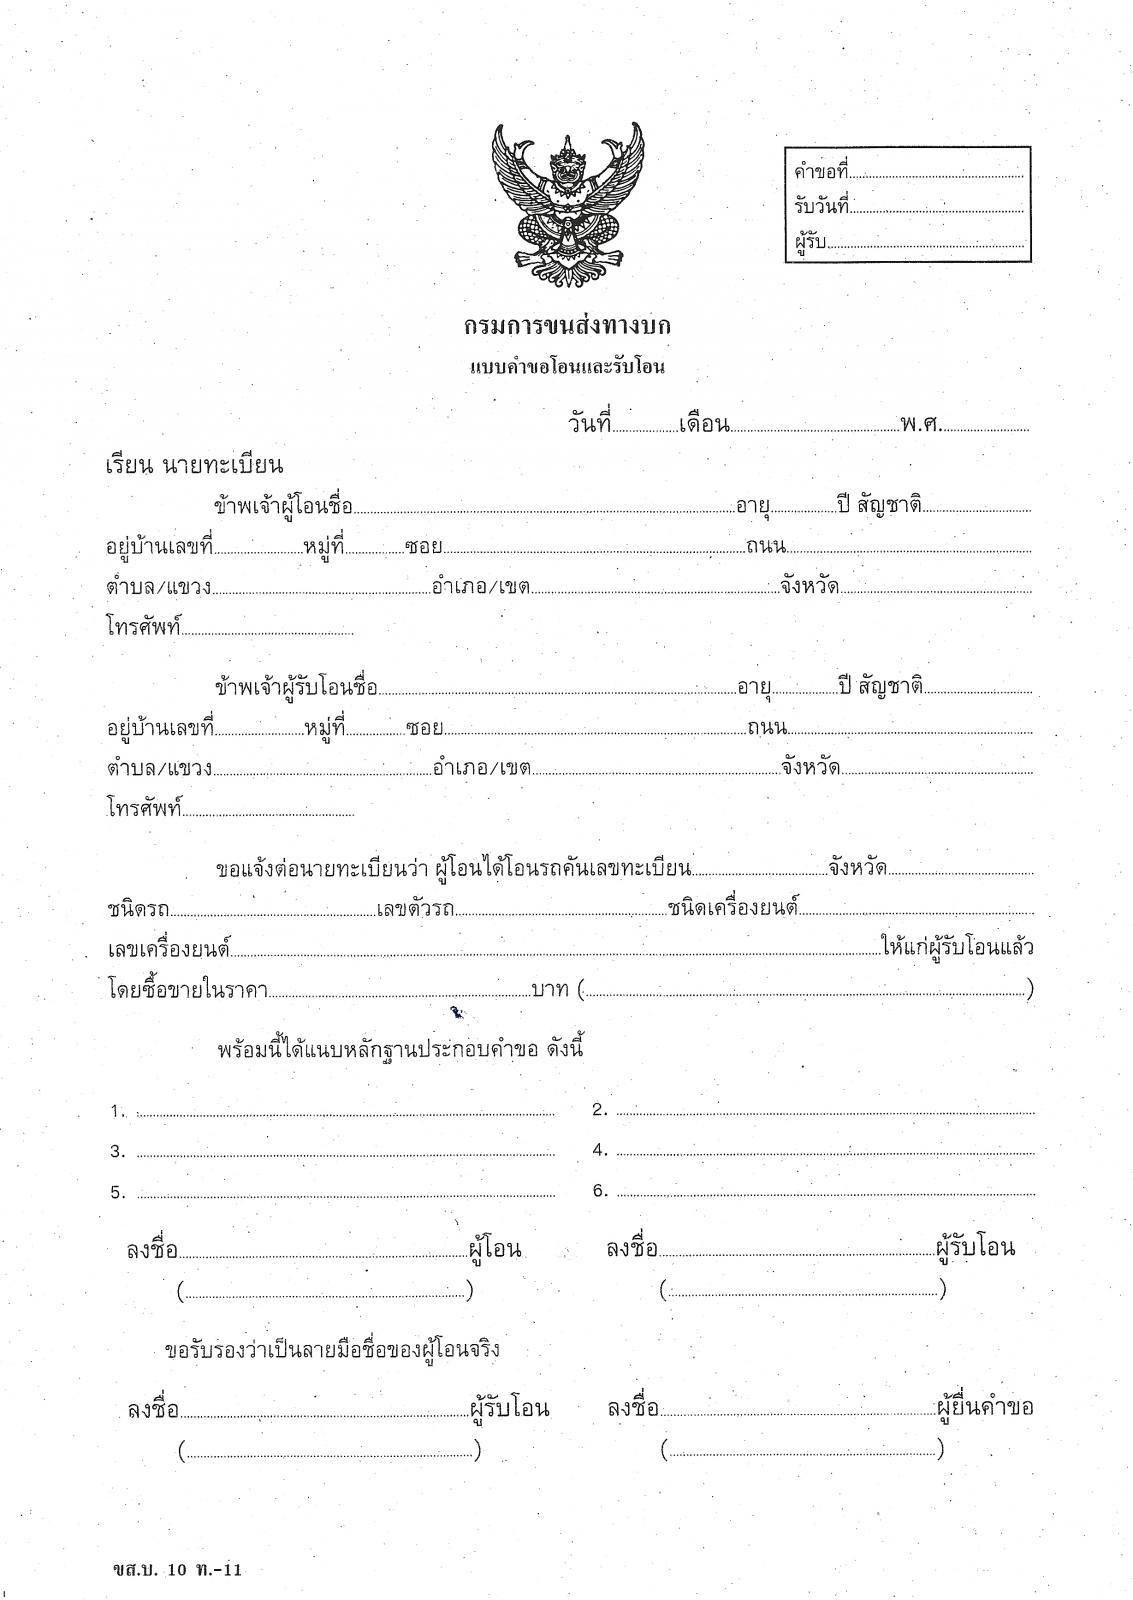 power of attorney form thailand pdf  Transfer of ownership farang to farang - Thailand Motor ...